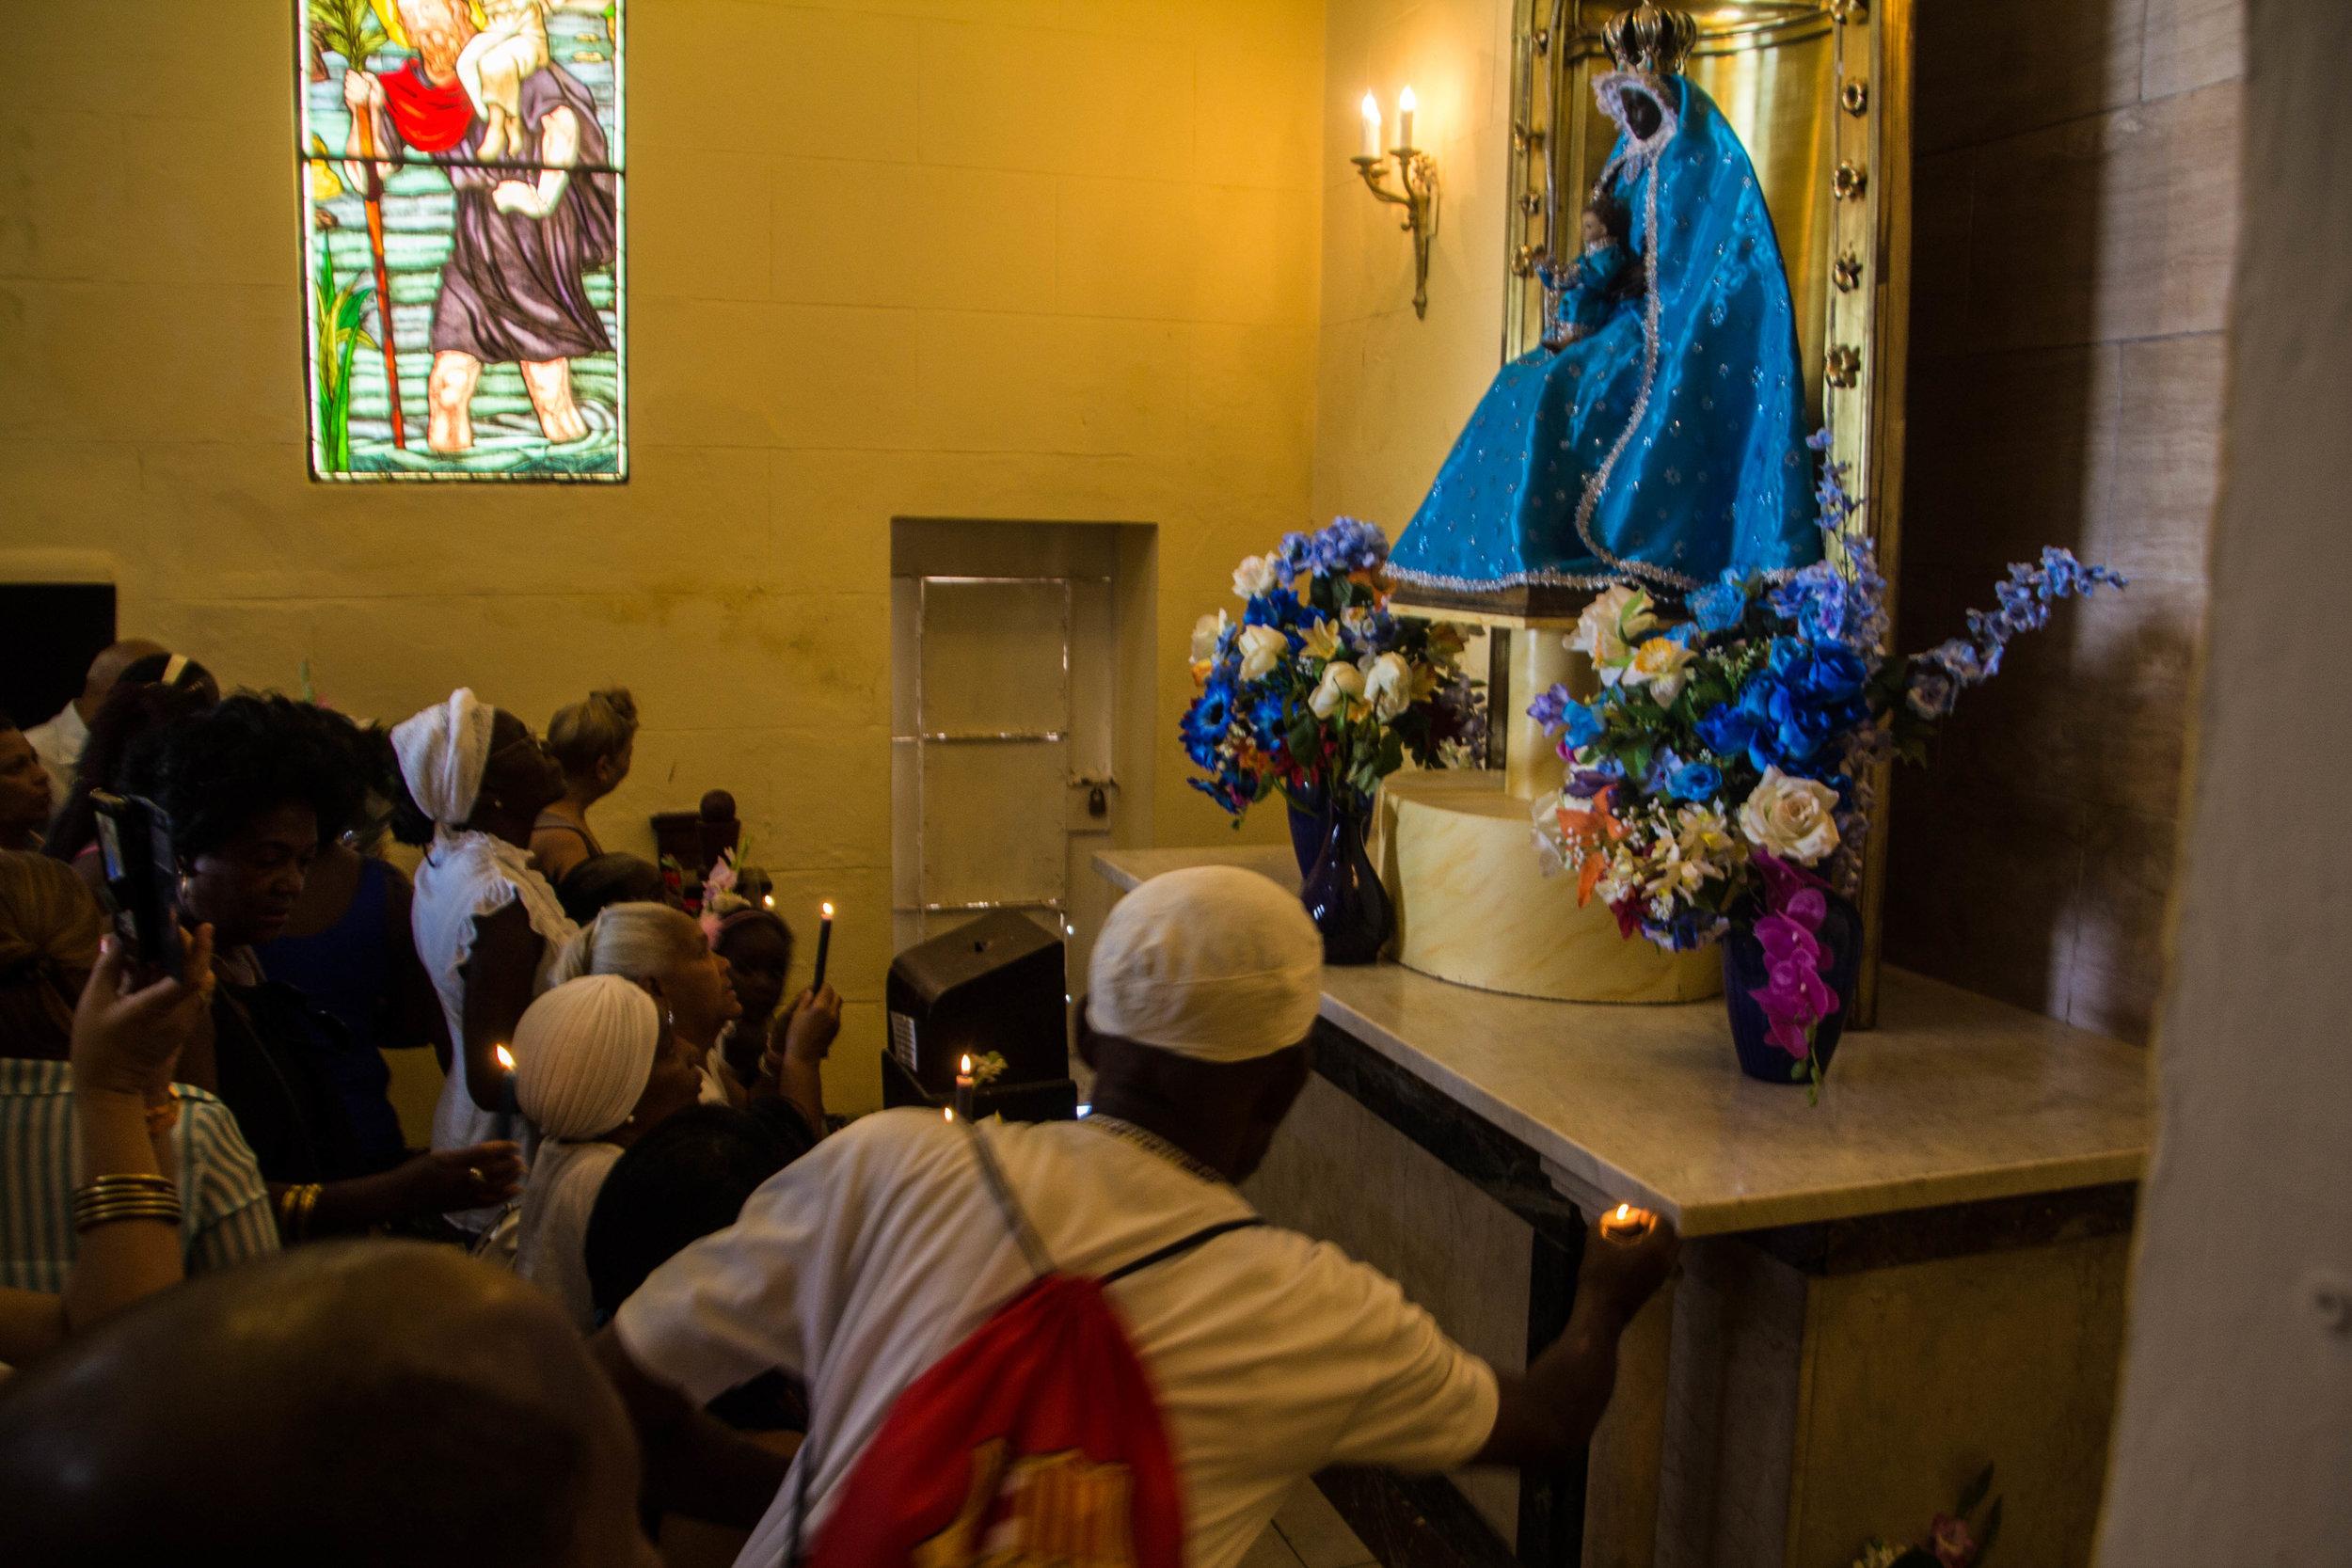 iglesia de nuestra señora de regla havana cuba santeria-1-9.jpg